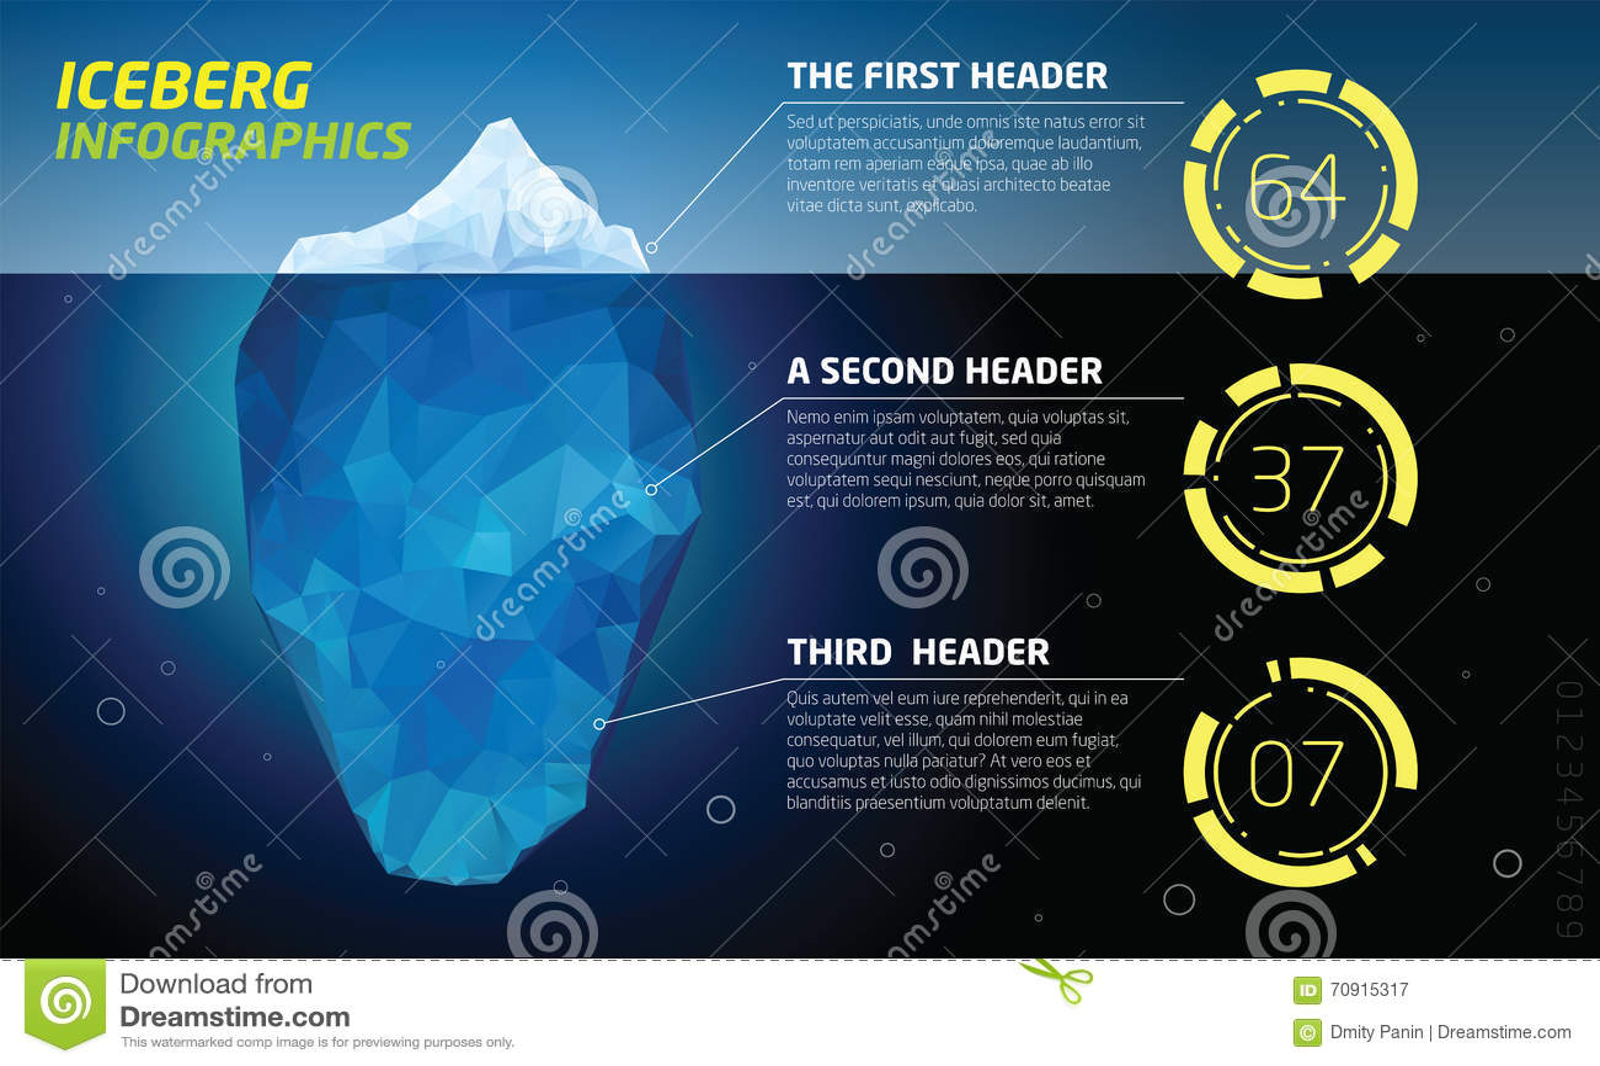 iceberg infographics ice and water sea stock image